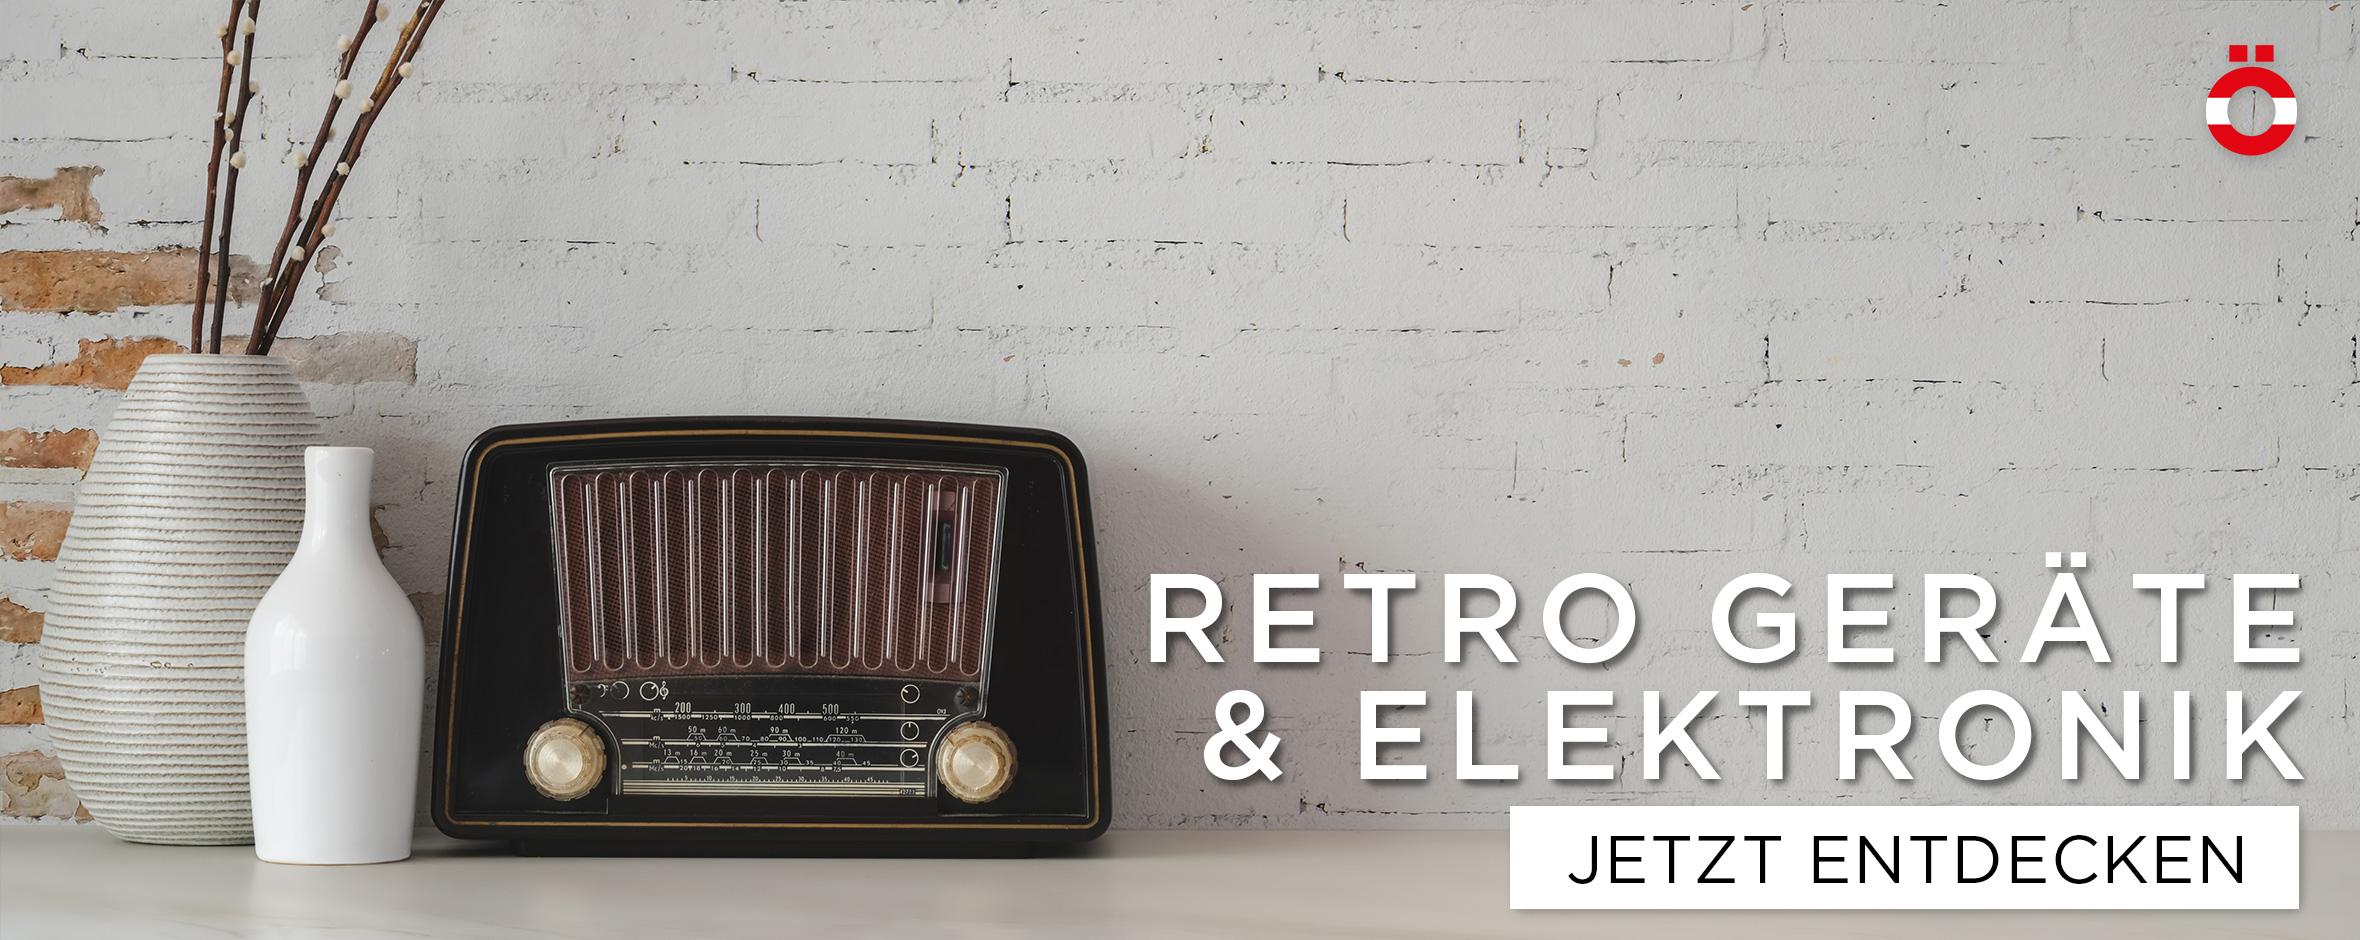 Retro Geräte & Elektronik online kaufen - shöpping.at